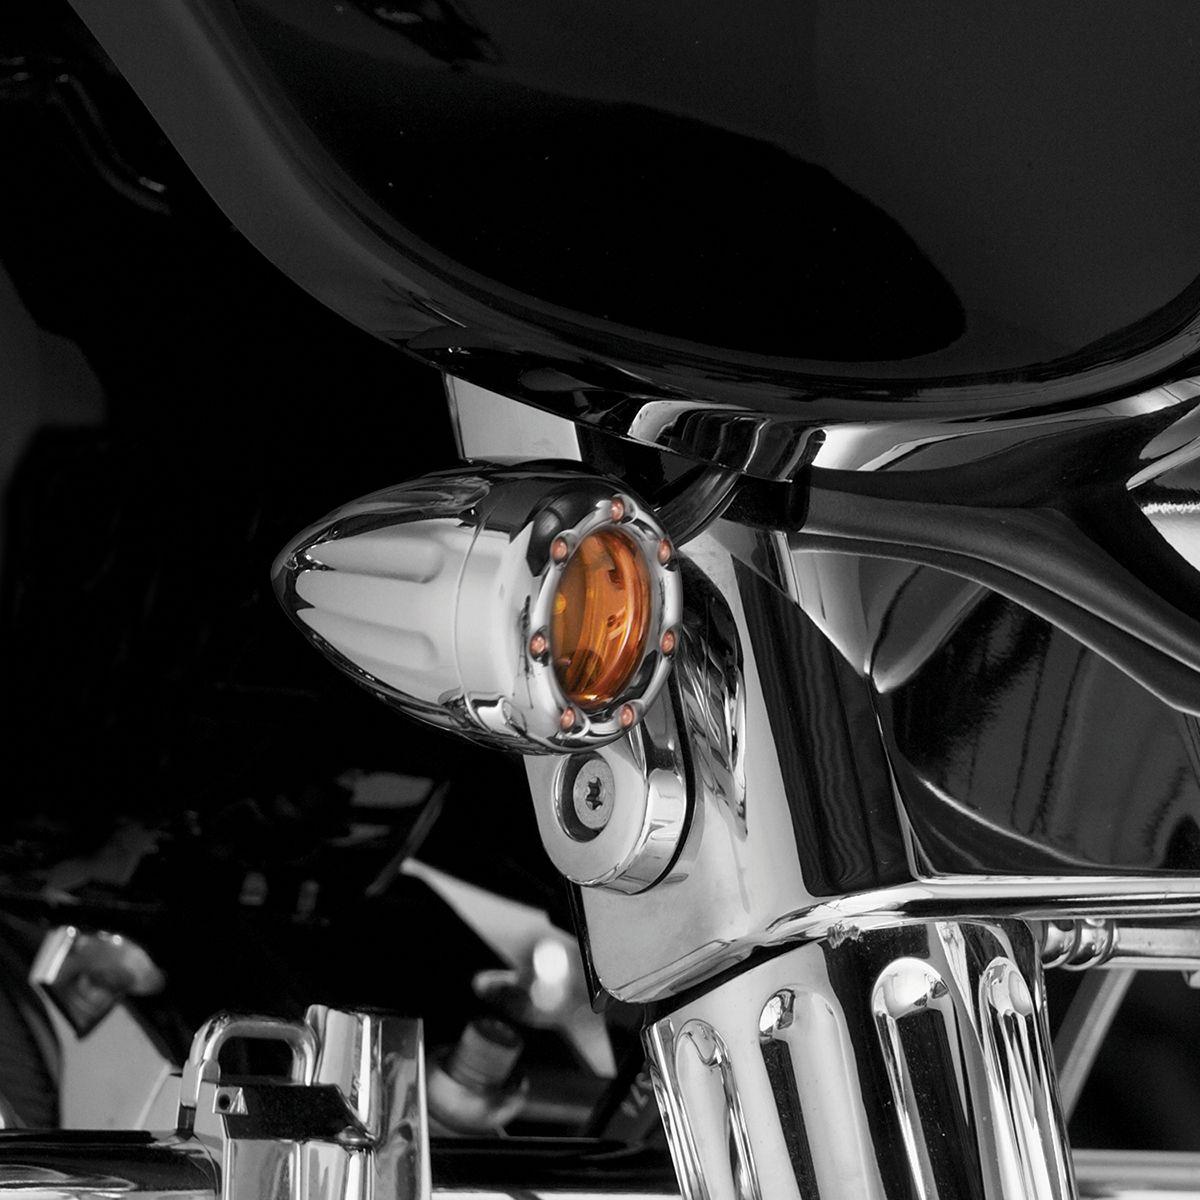 【ARLEN NESS】LED 方向燈 CHR WH [2040-0840] - 「Webike-摩托百貨」